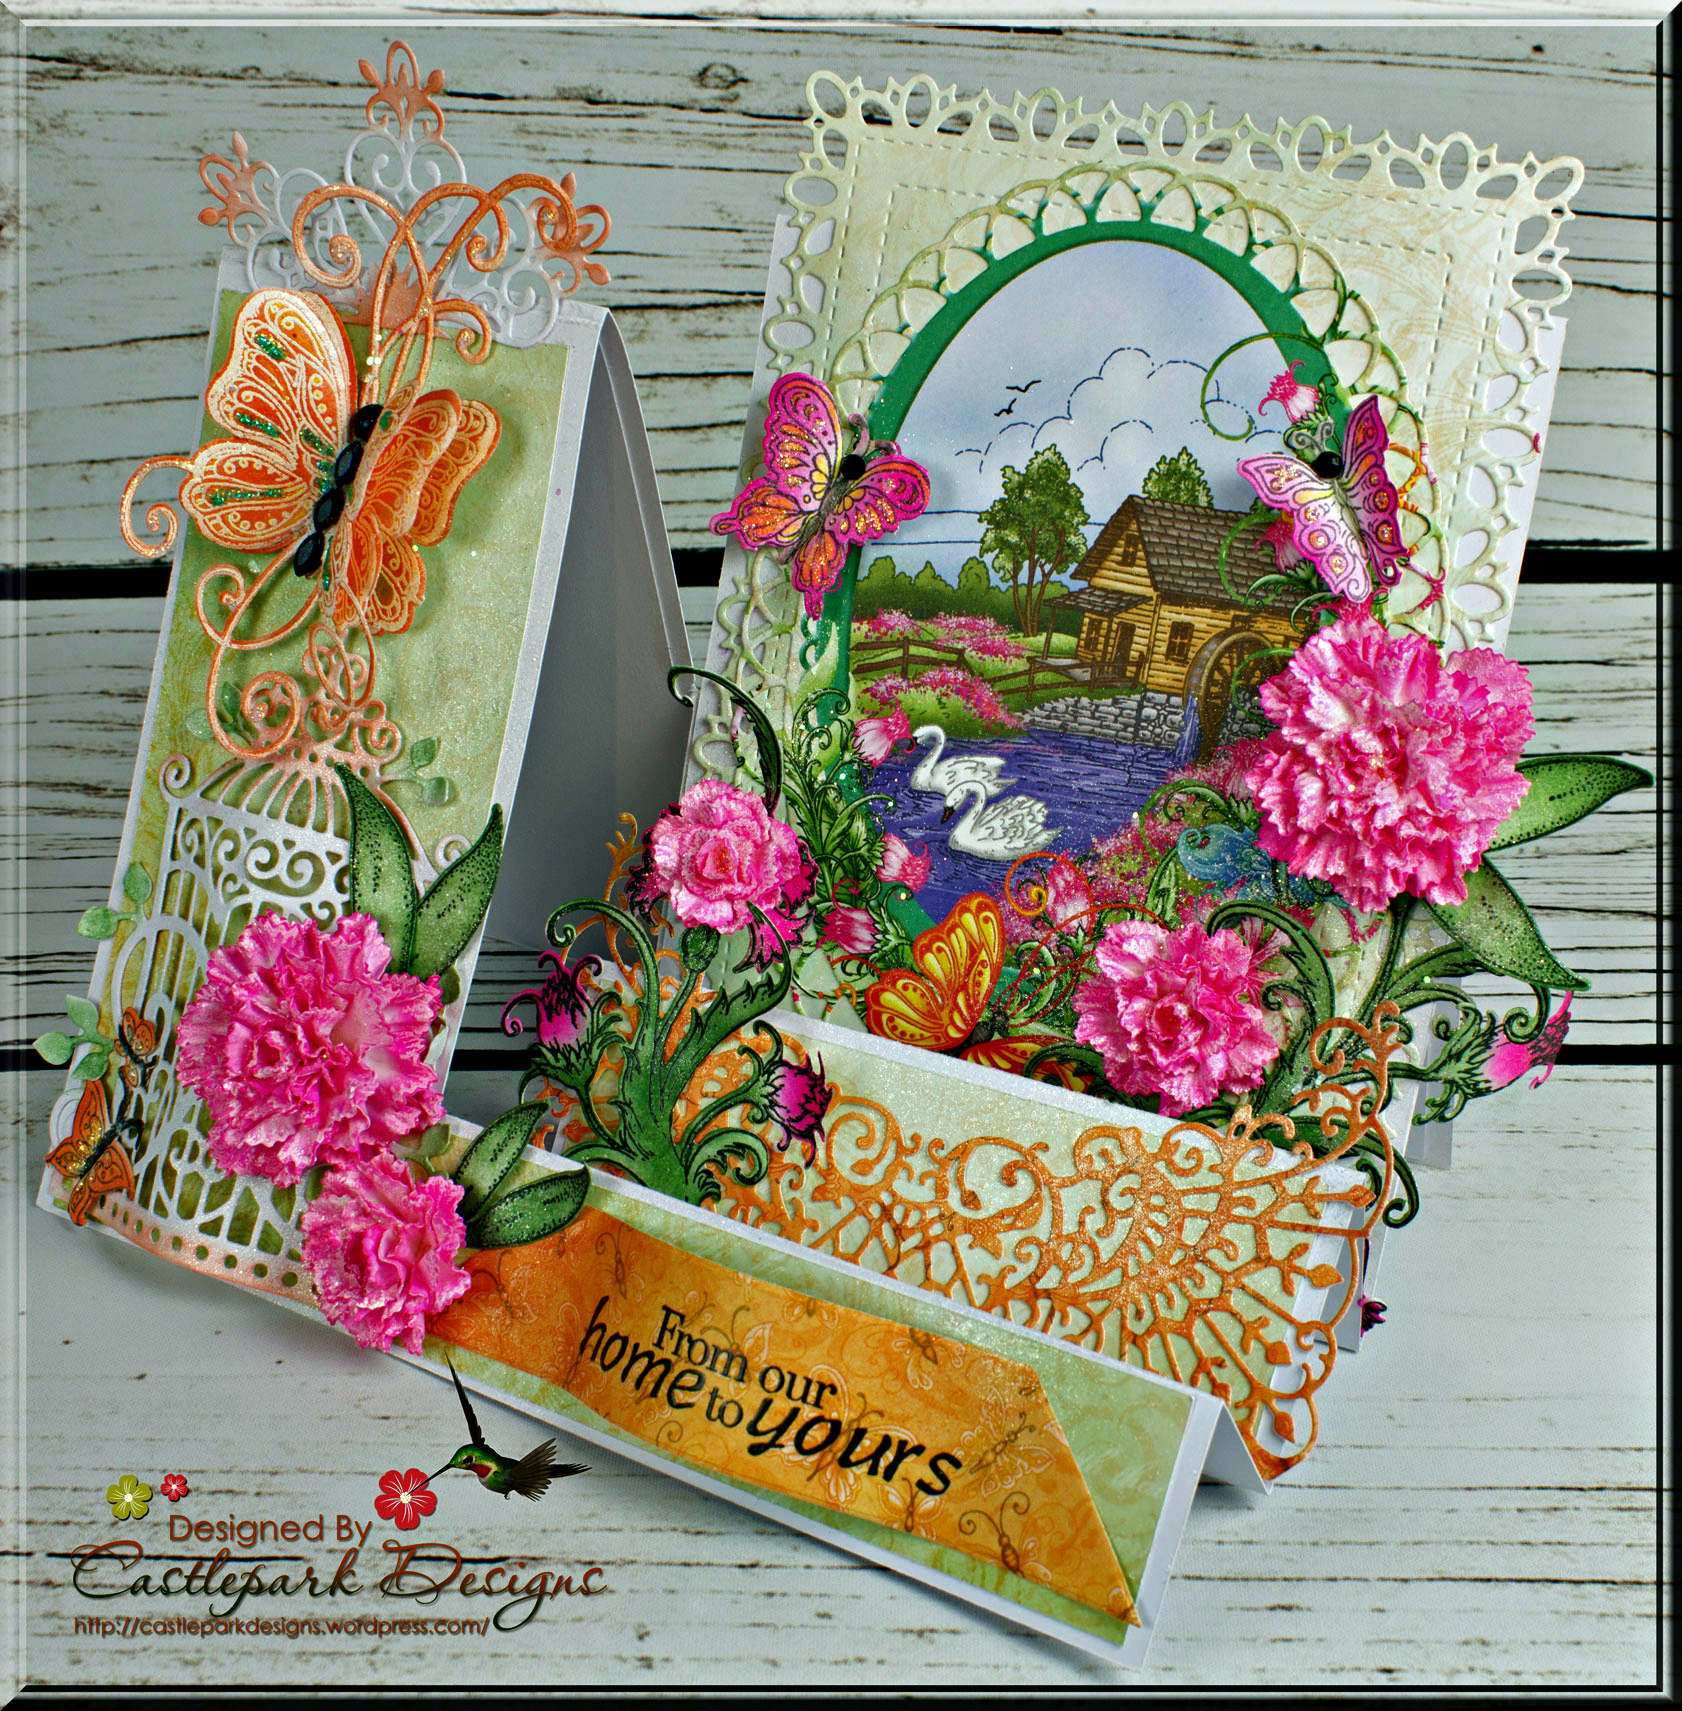 Hcd1 7164 Heartfelt Creations Cut /& Emboss Dies ~small Camelia Carnation